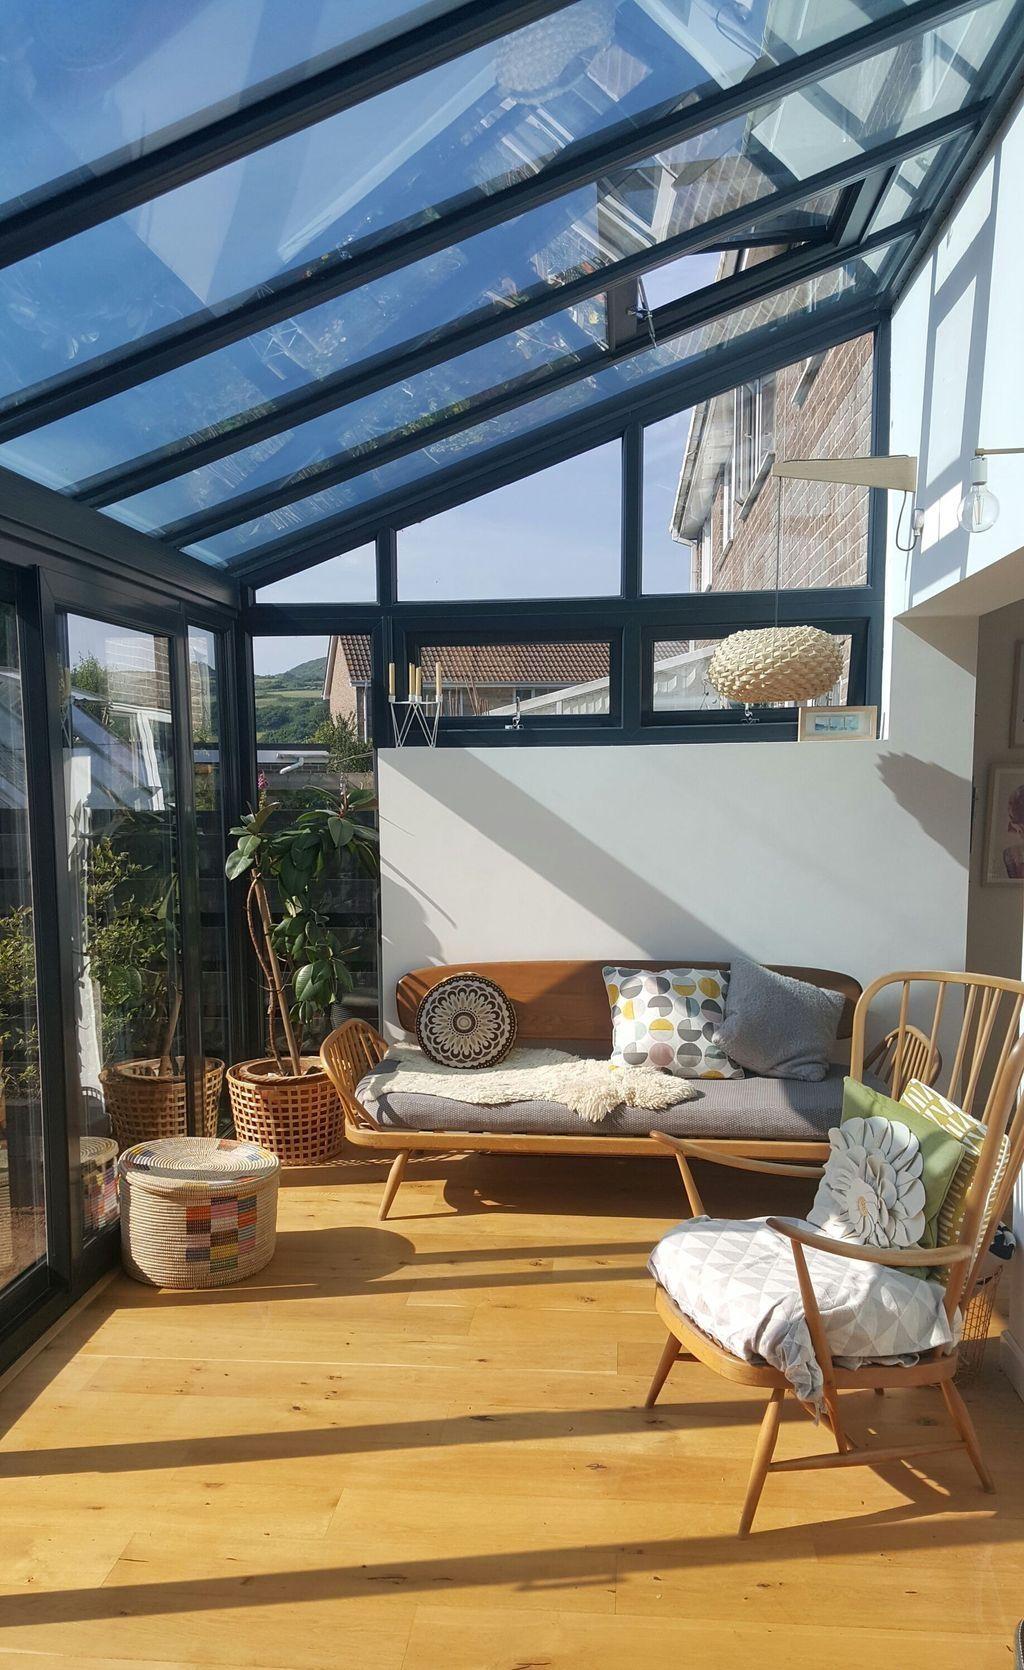 20 Unordinary Sunroom Design Ideas For Interior Home Sunroom Designs Home Garden Room Awesome sunroom design ideas